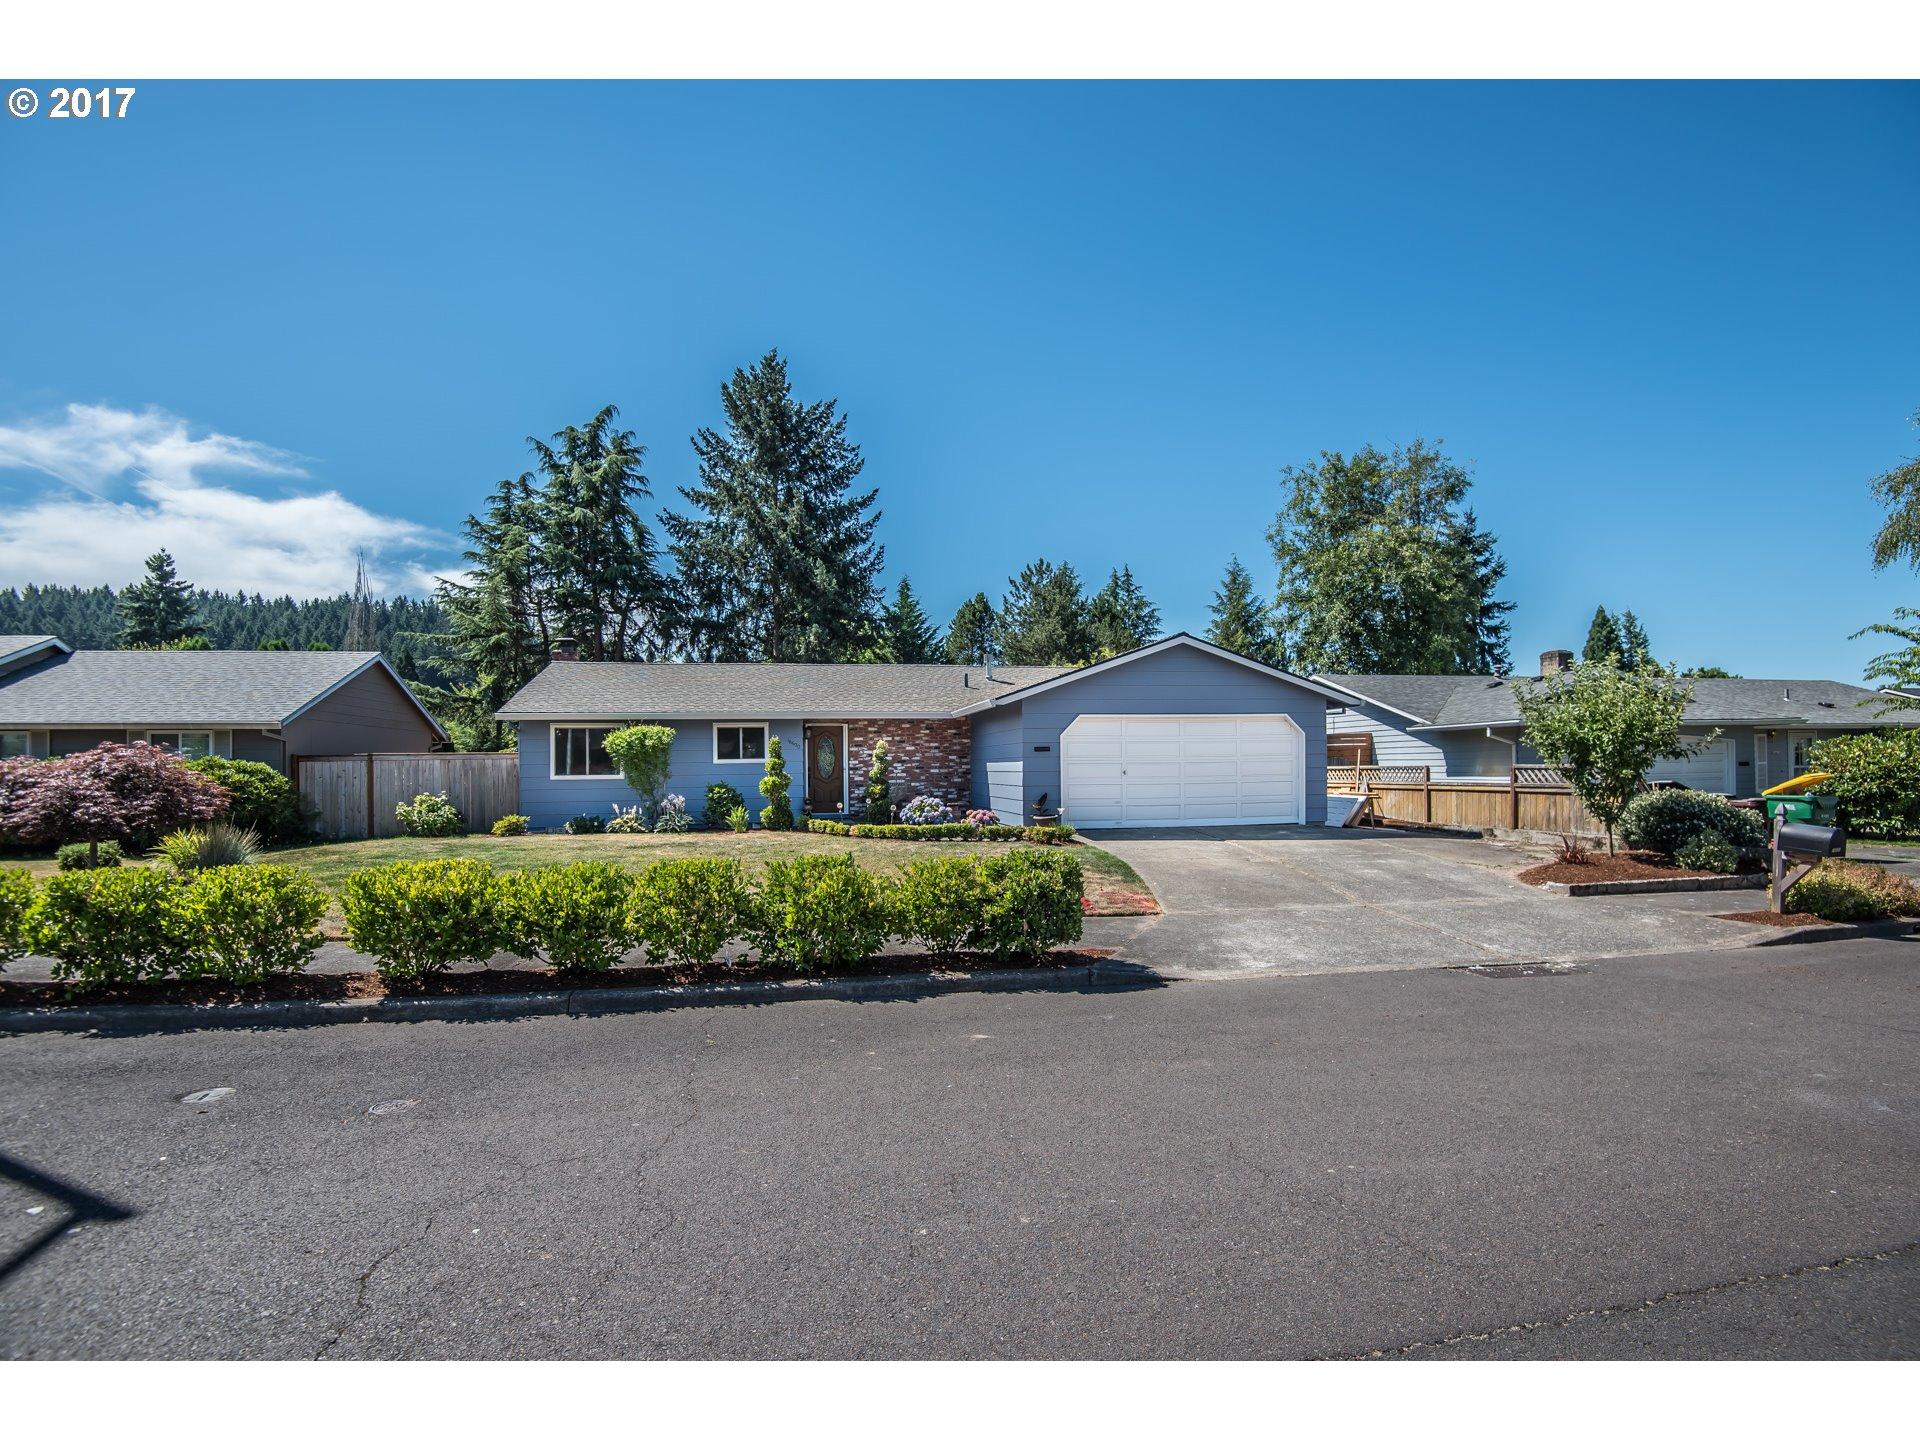 16600 SW Rosa RD, Beaverton, OR 97007